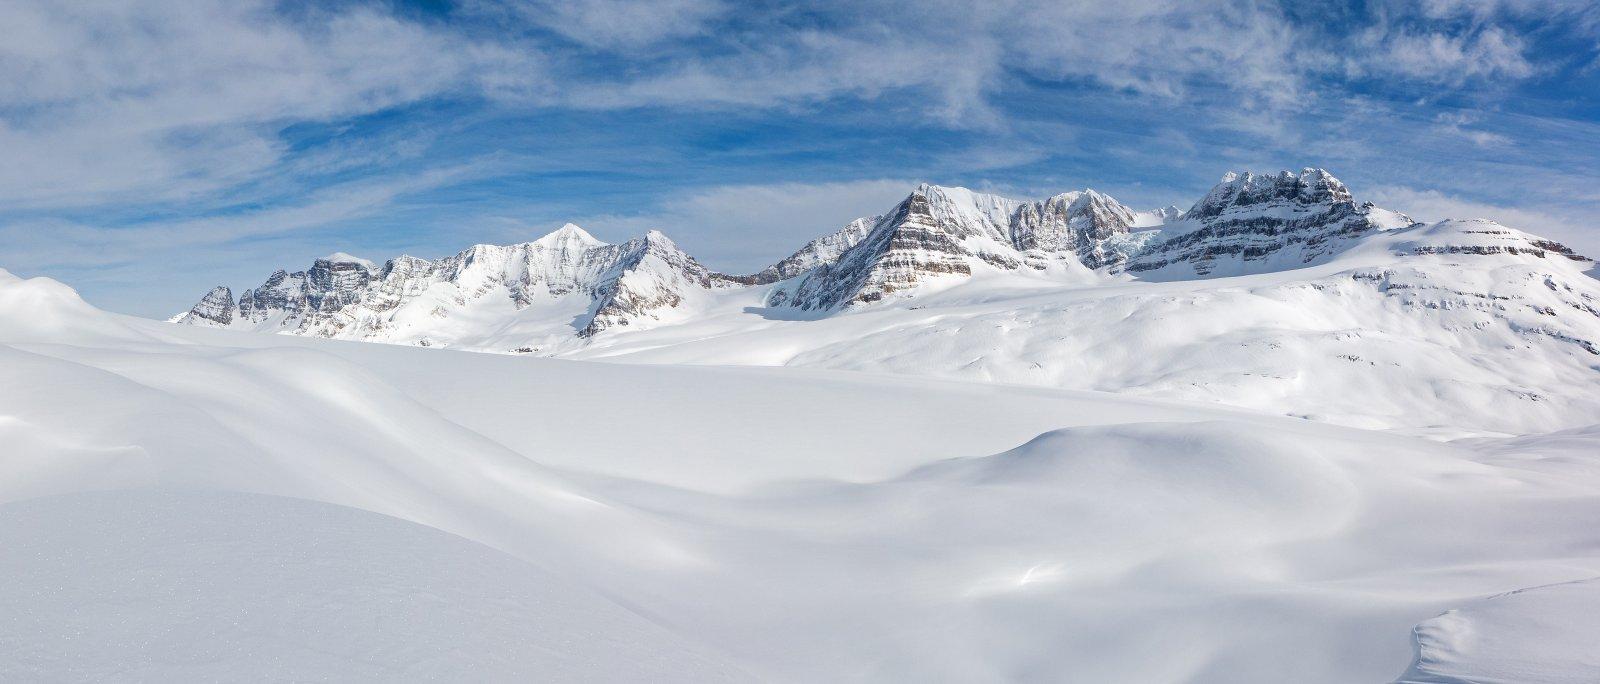 IcefieldPanorama-edited-1-copy.jpg